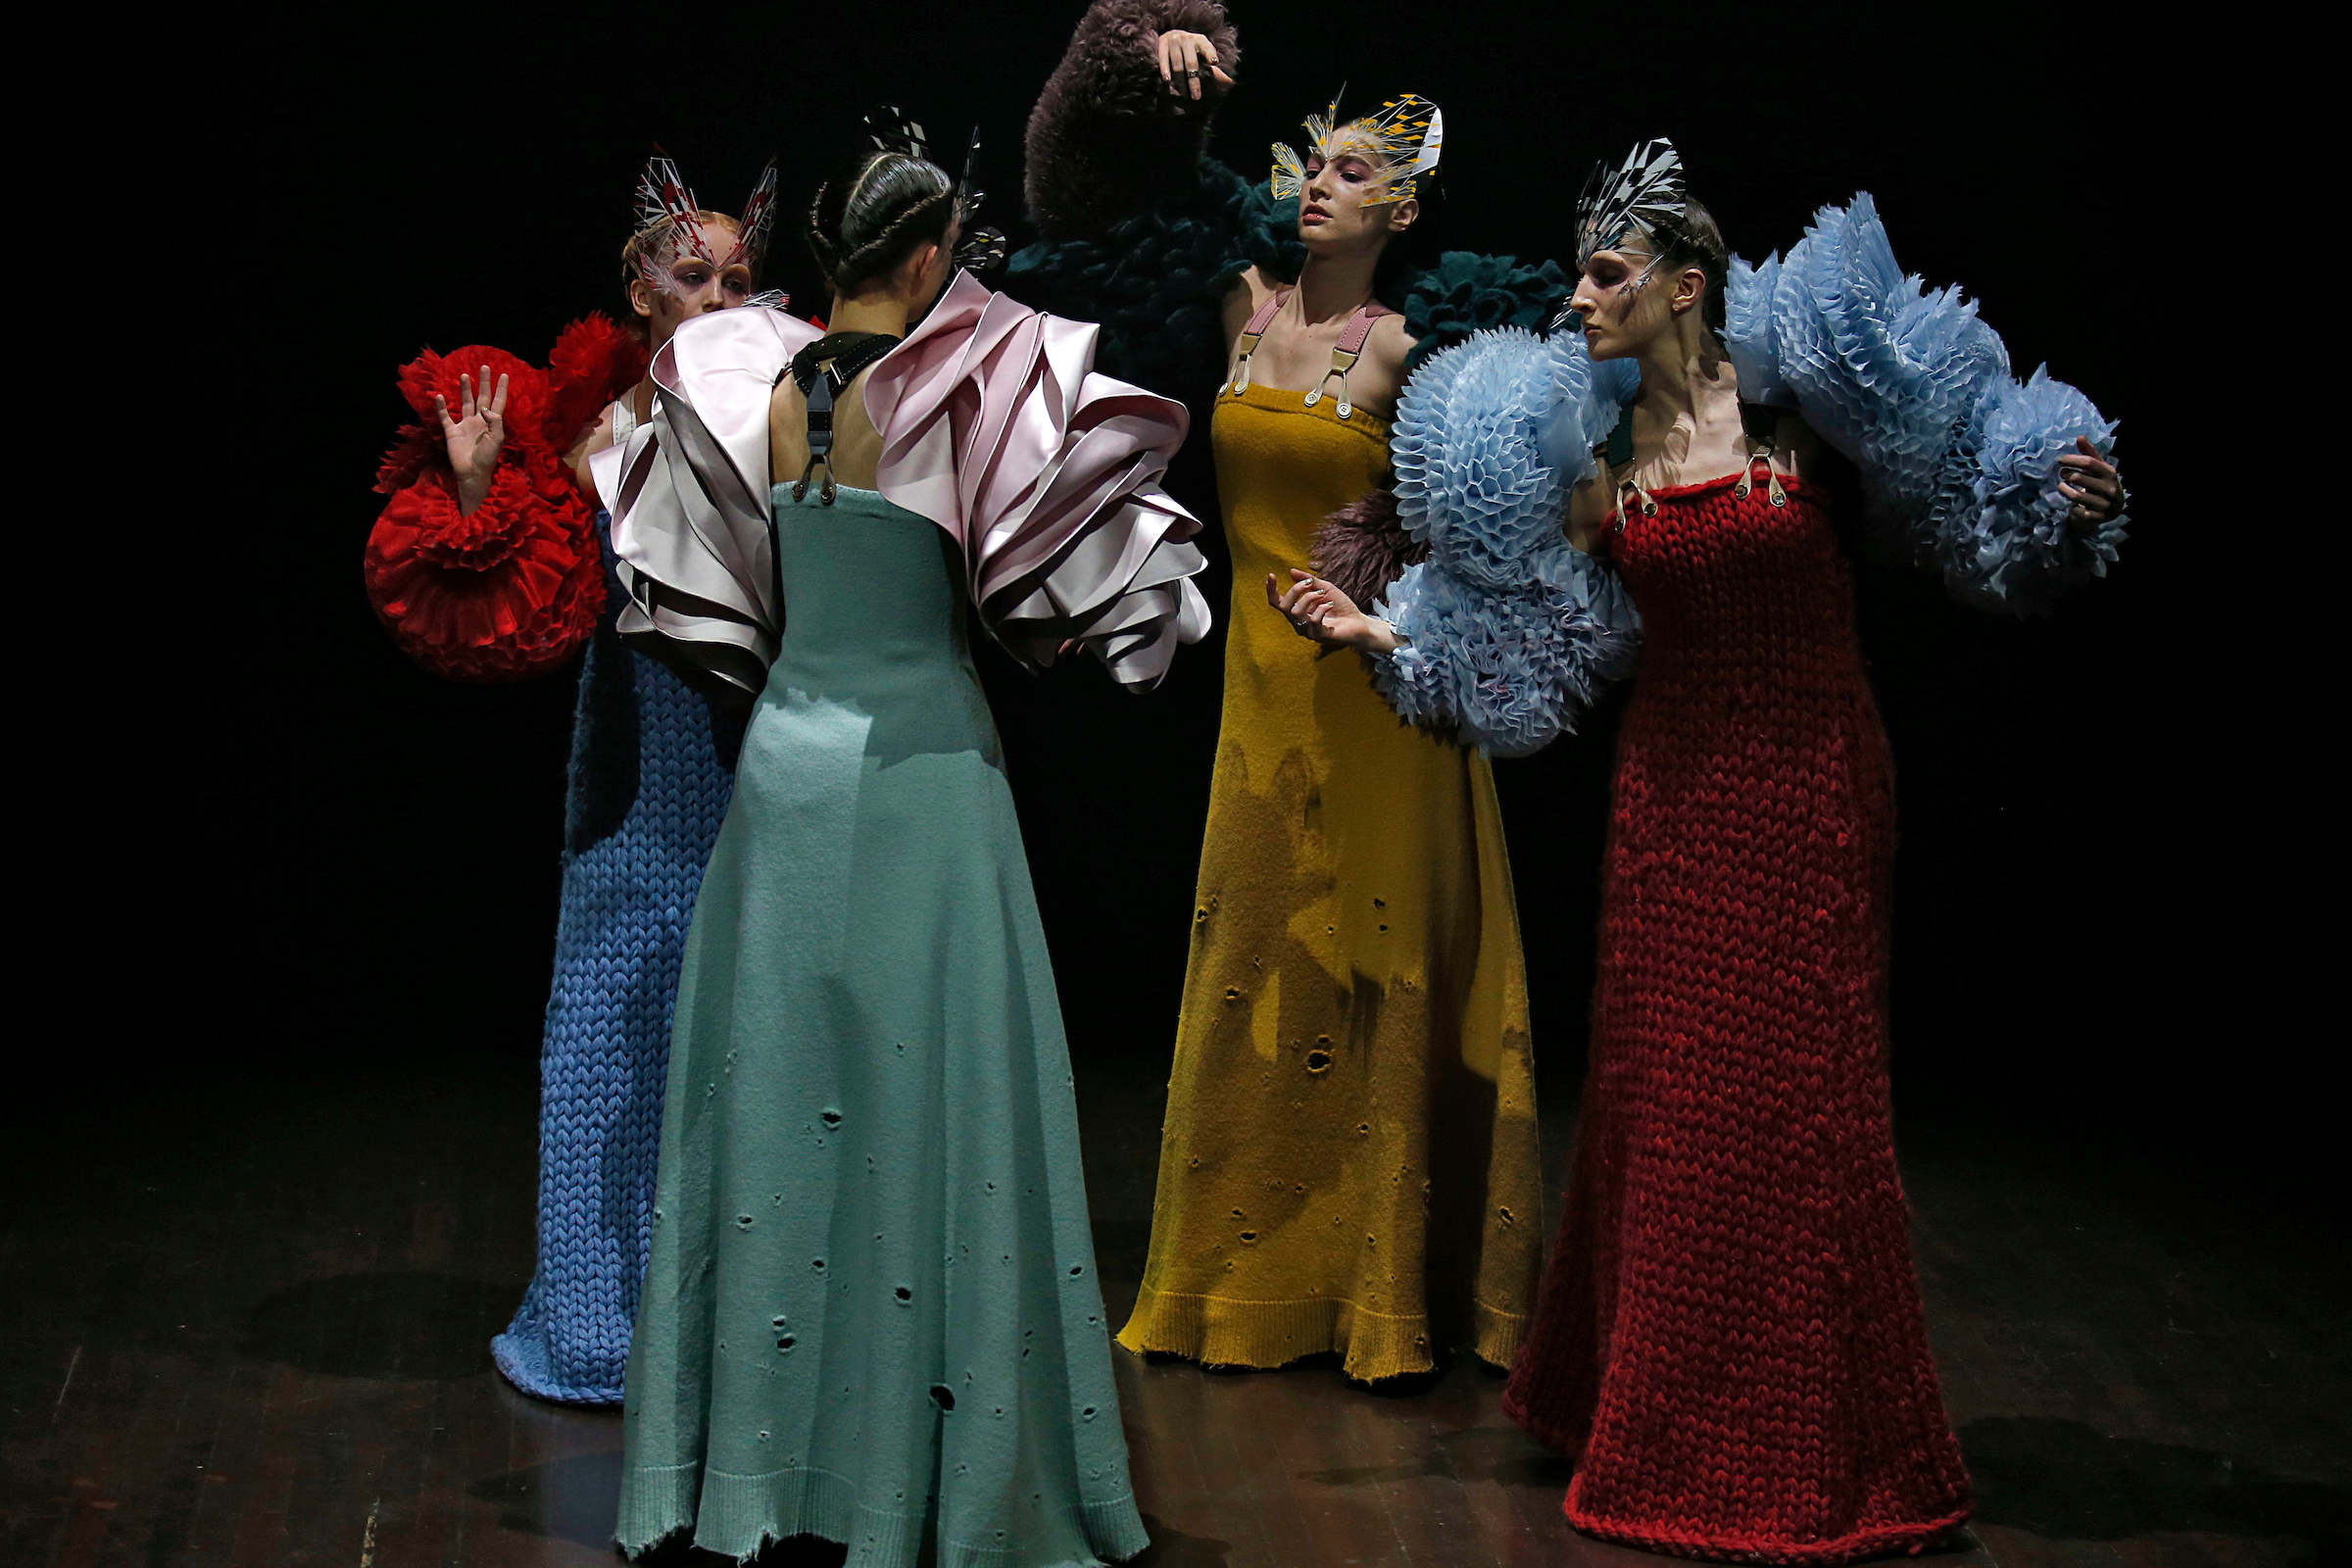 Performance da Undercover por Jun Takahashi ©Agência Fotosite